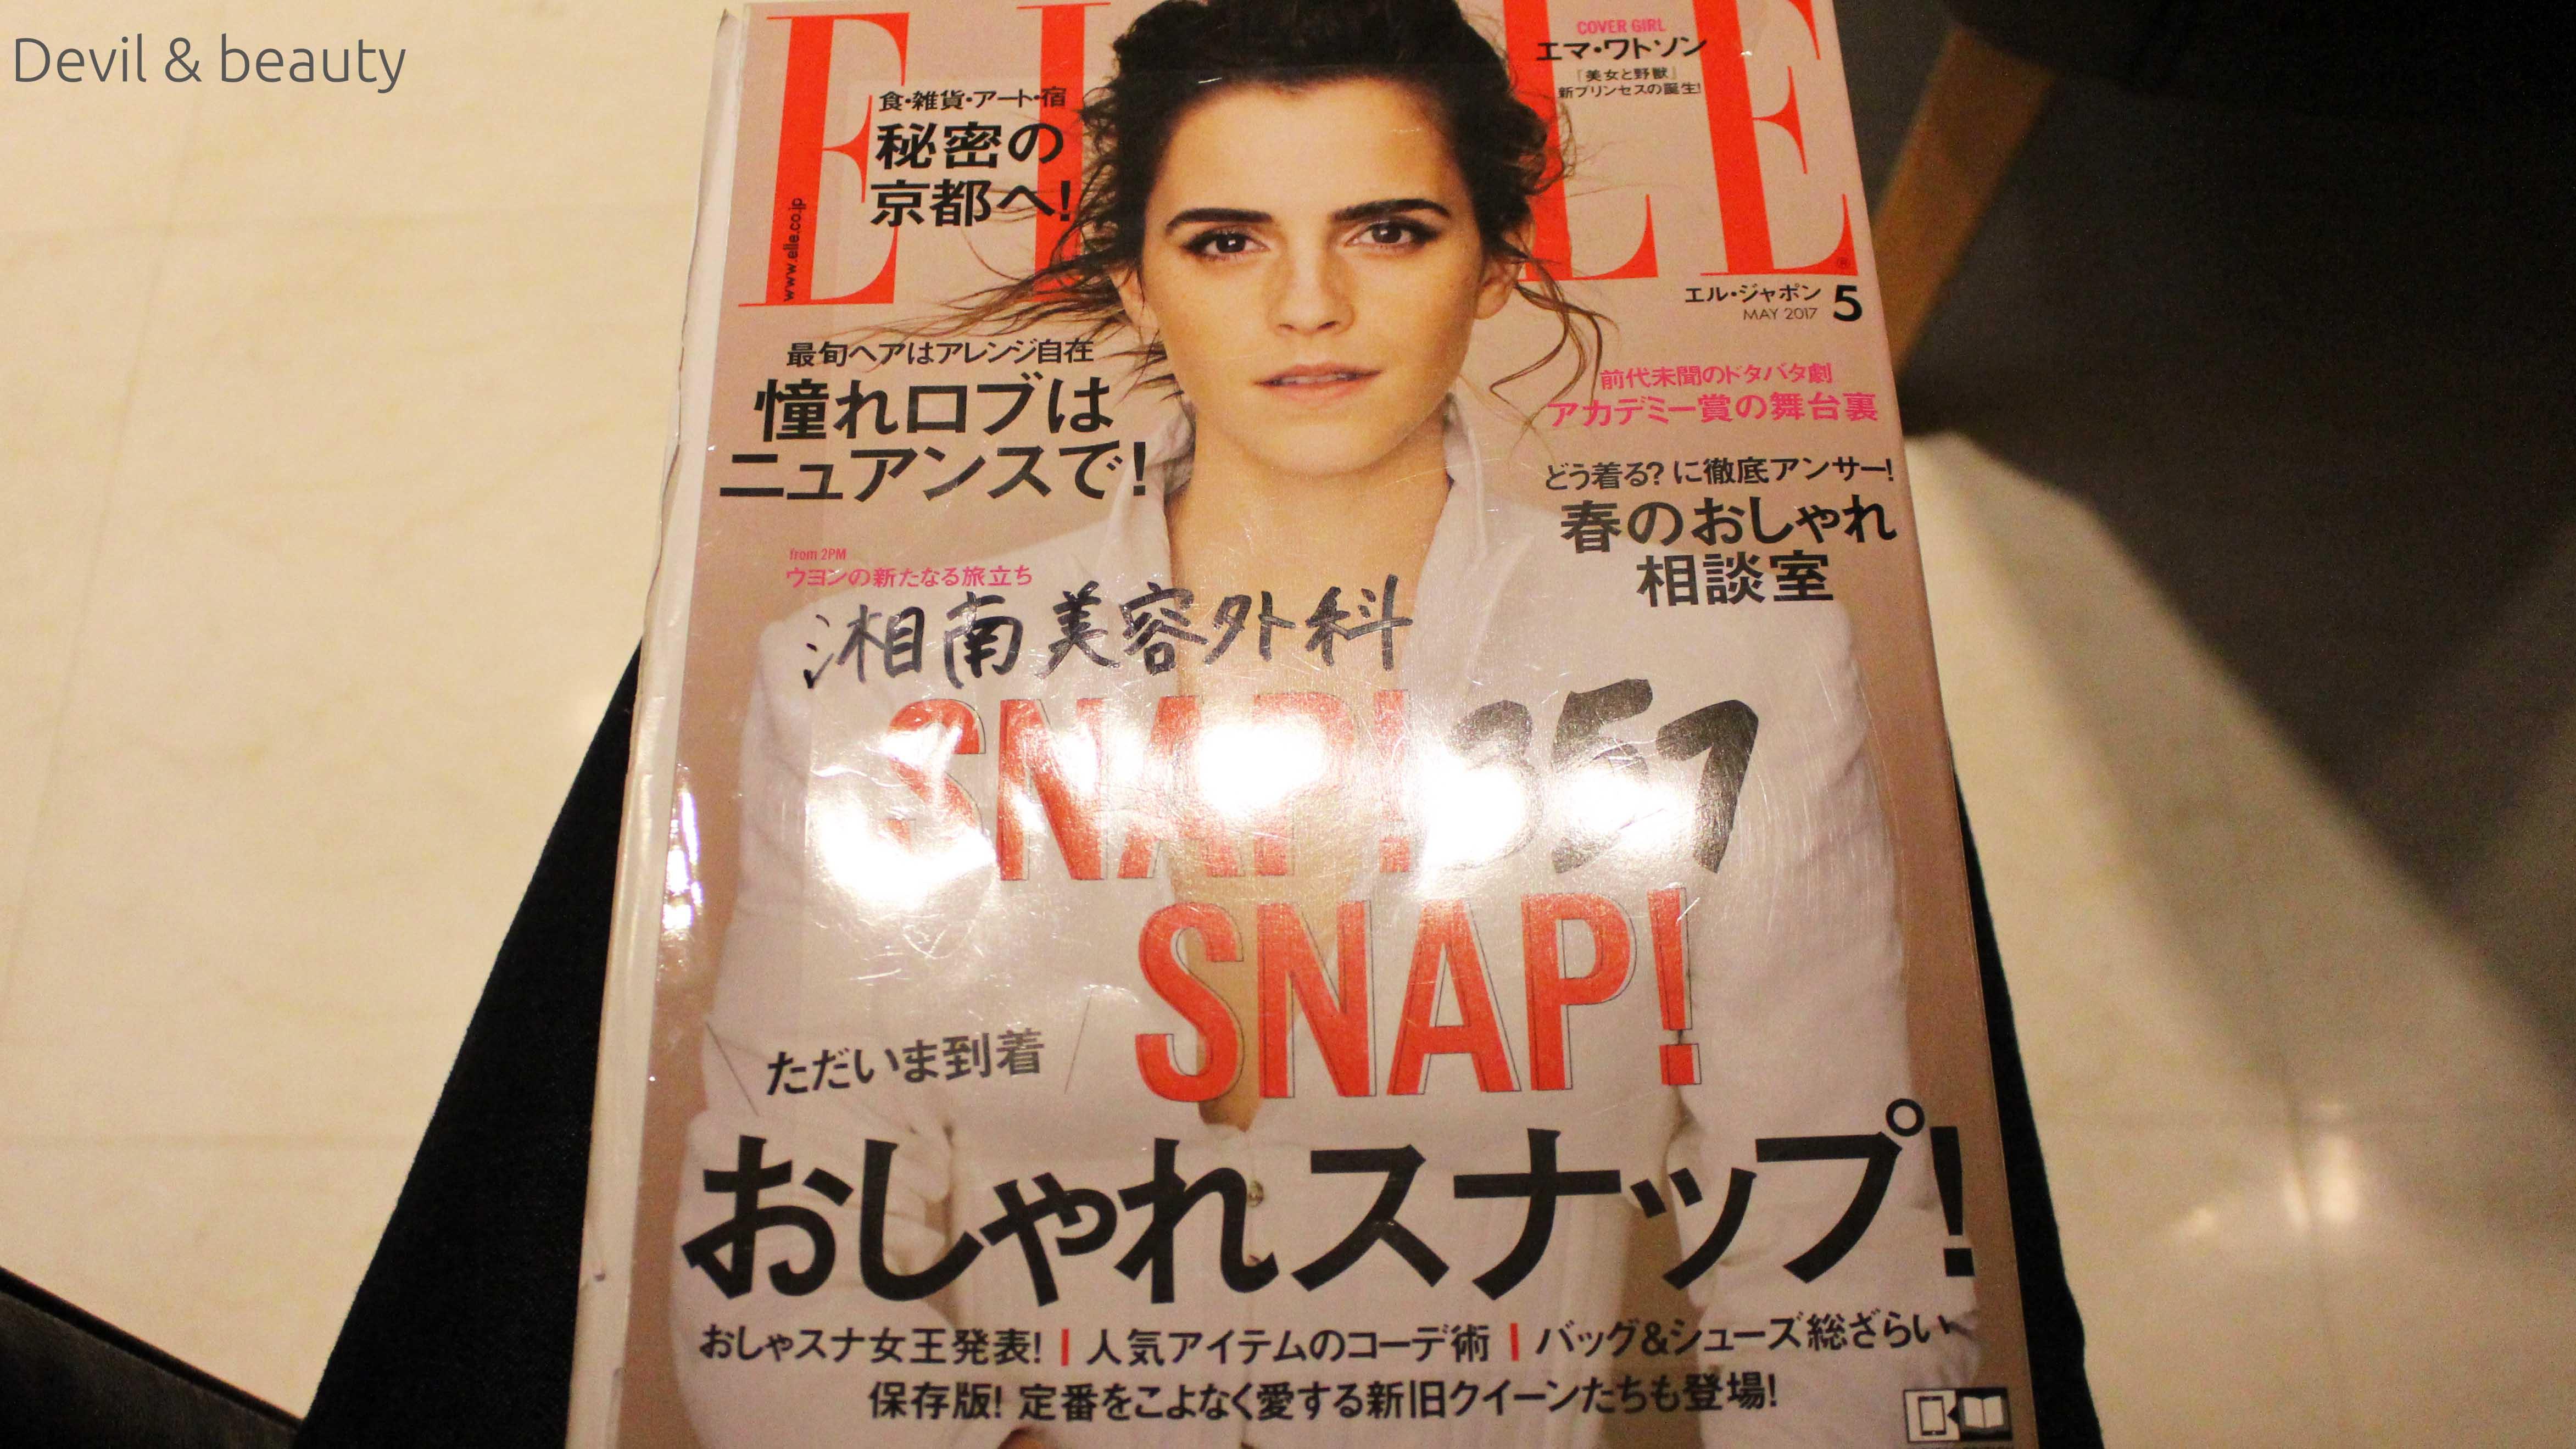 shonan-beauty-clinic-shinjuku6 - image